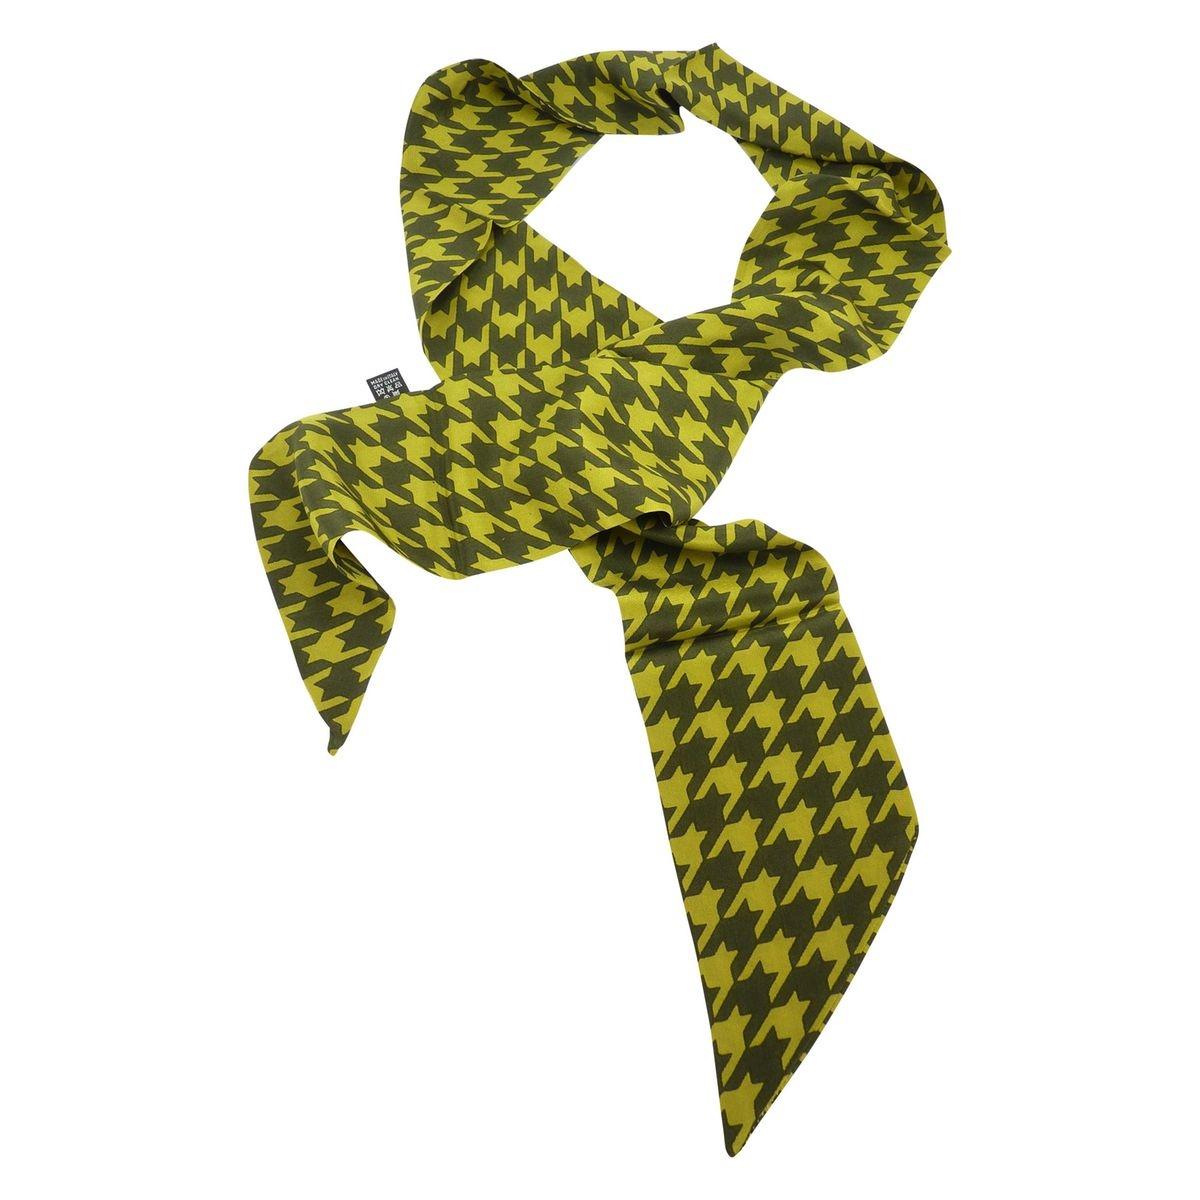 Foulard carre imprime en soie vert femme